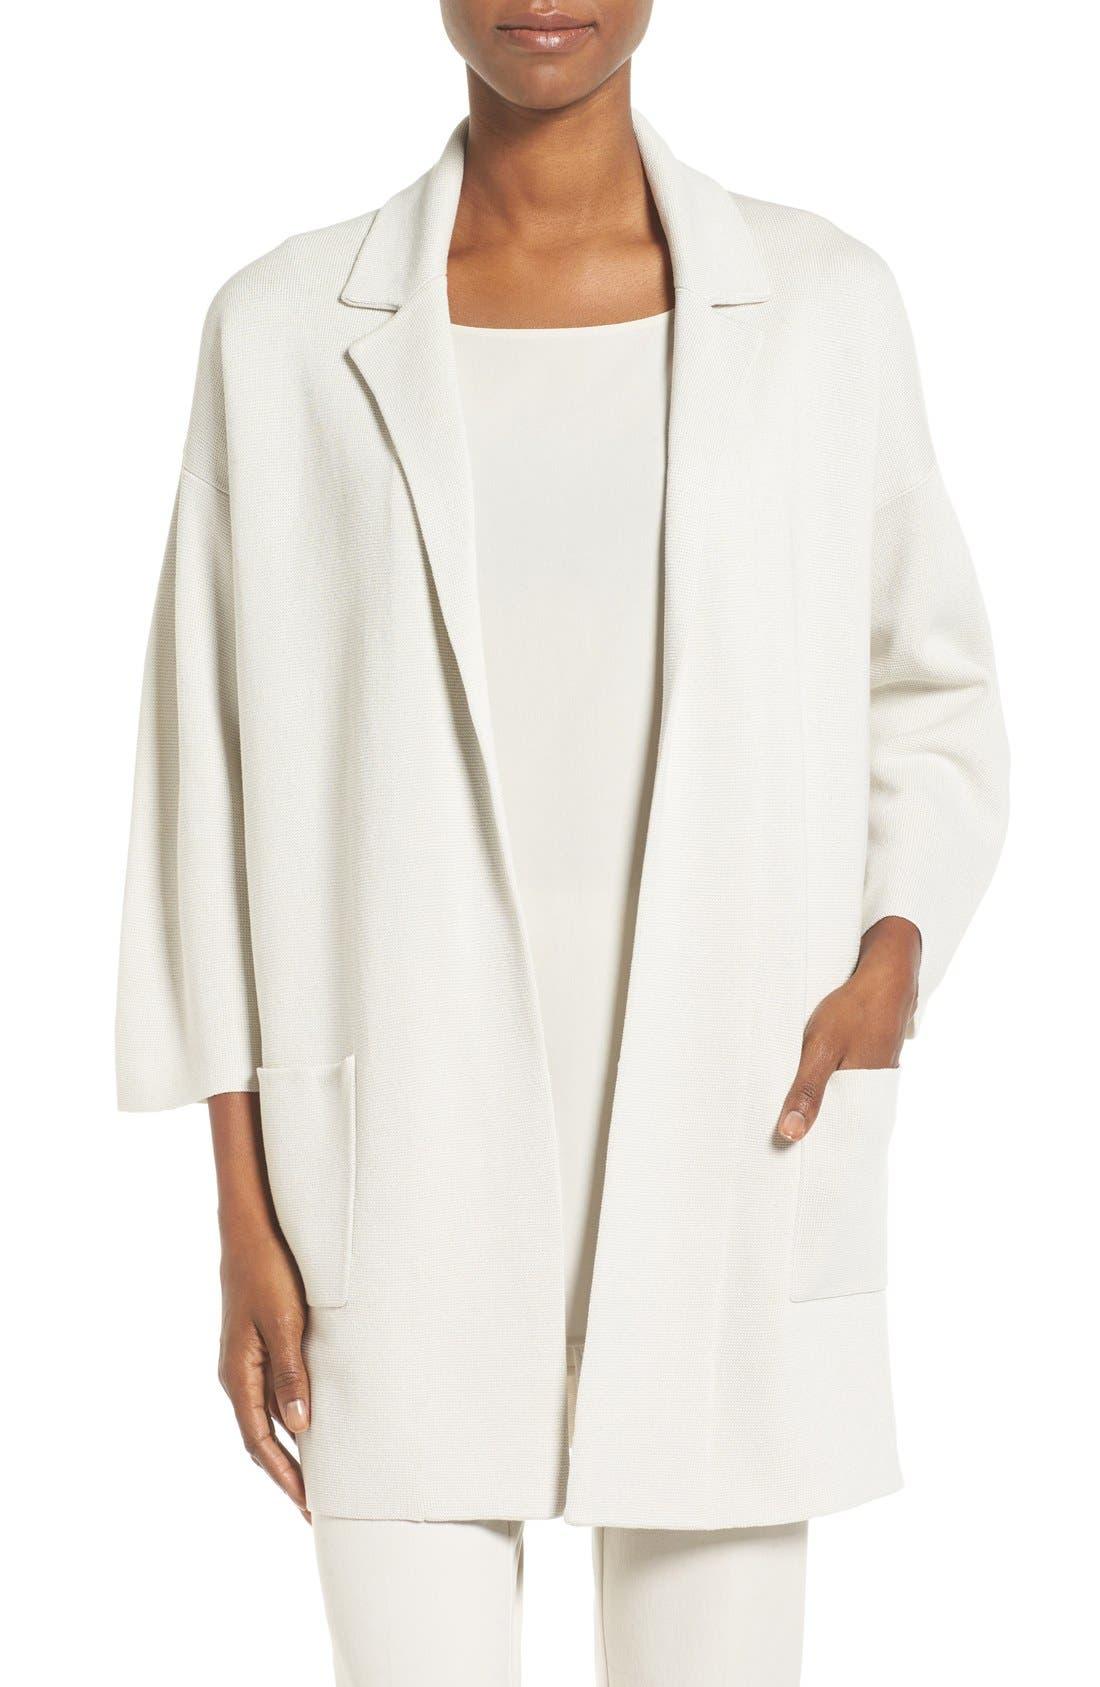 Alternate Image 1 Selected - Eileen Fisher Silk & Organic Cotton Jacket